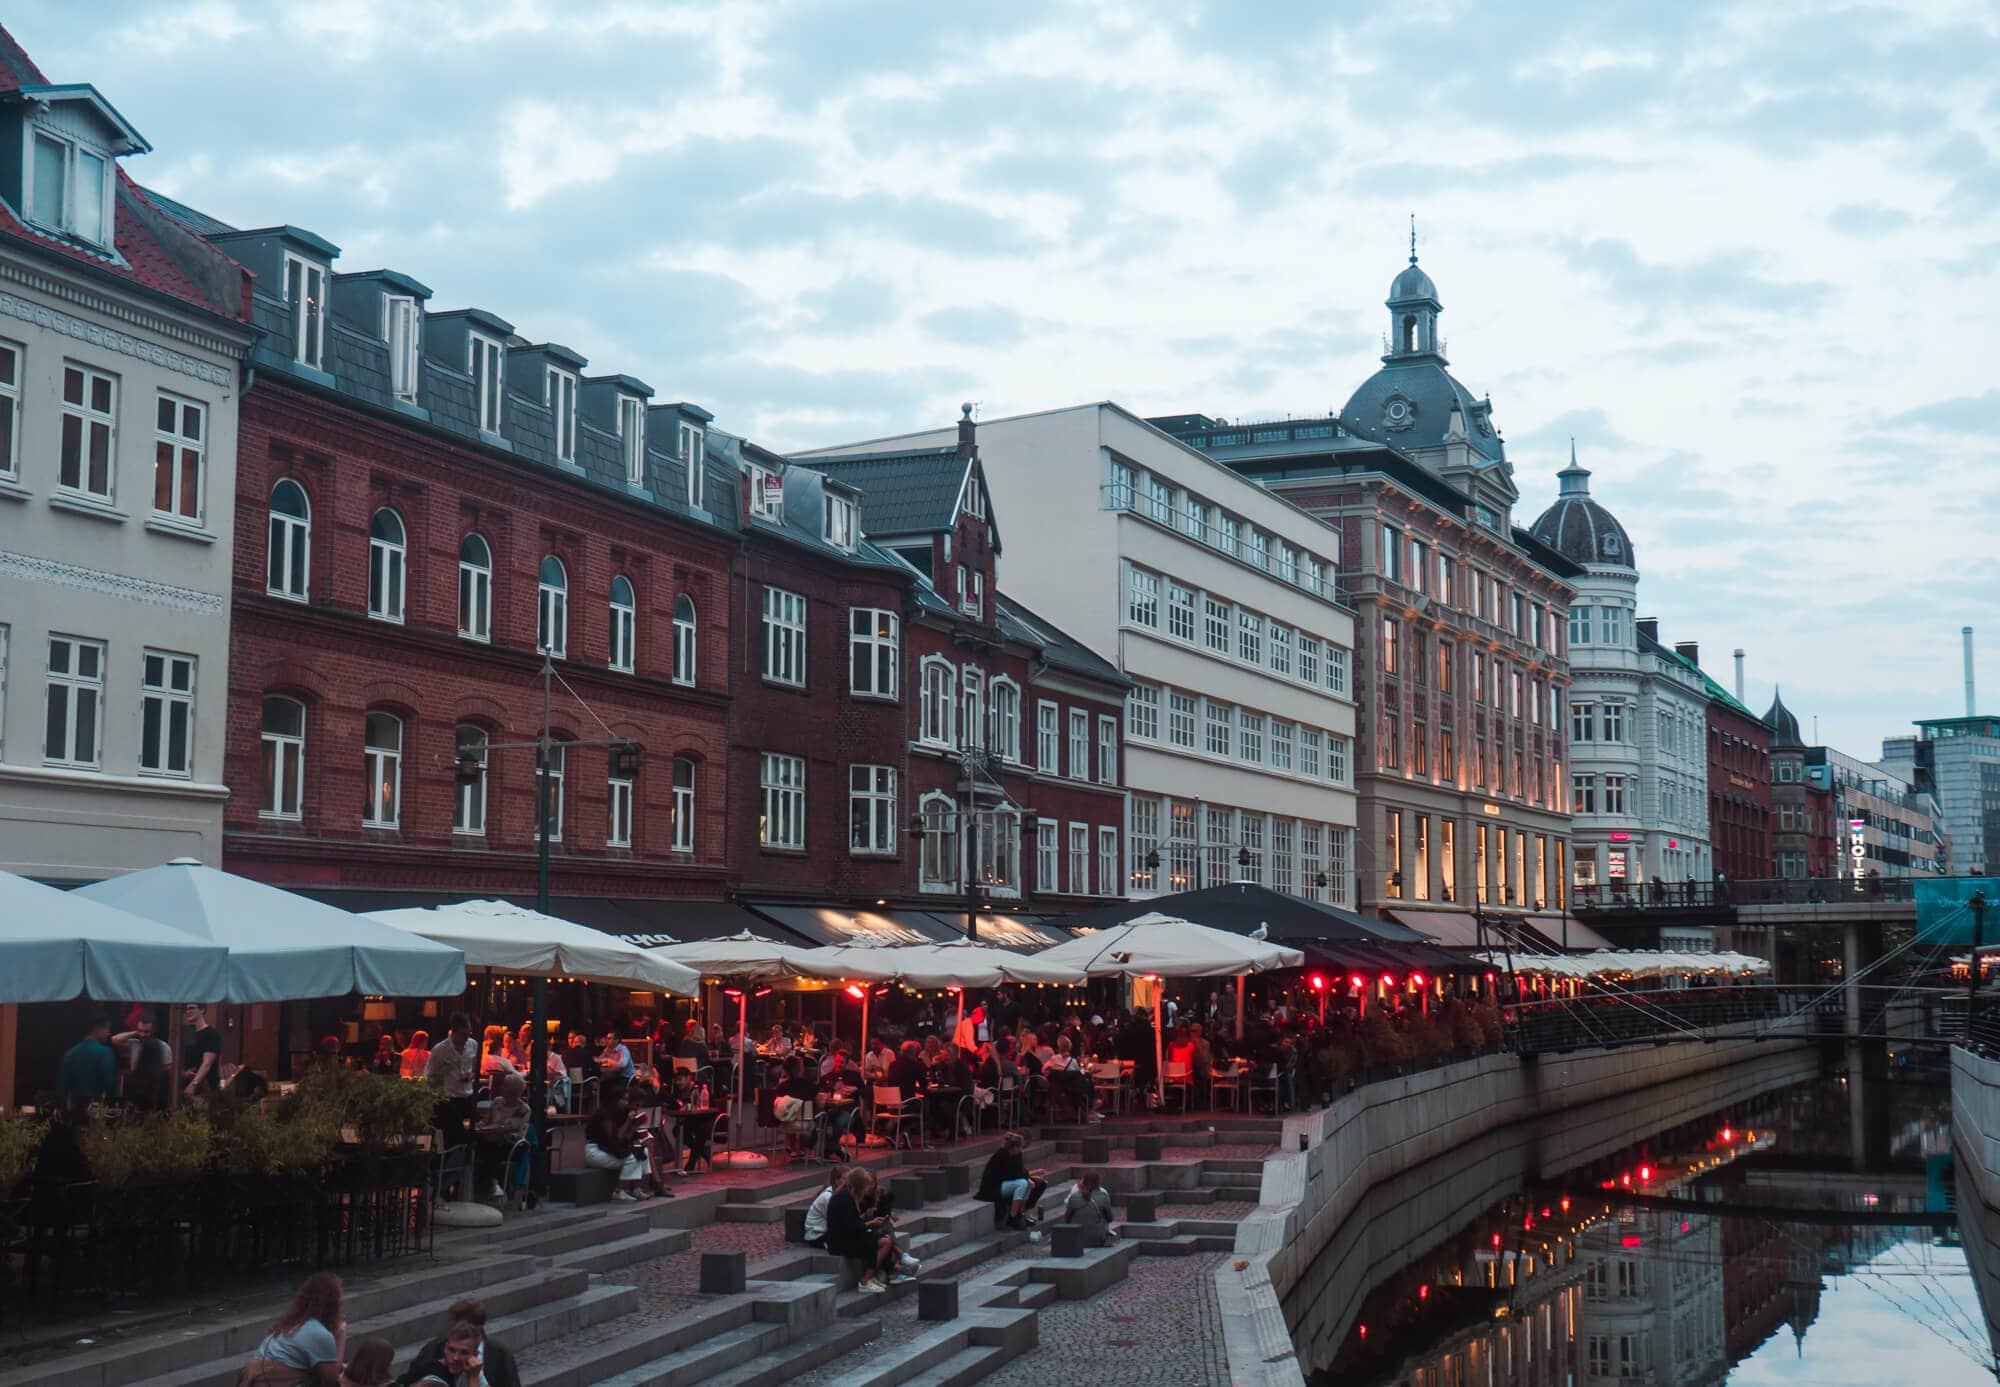 Two days in Aarhus - Denmark's happiest city. Aarhus weekend guide